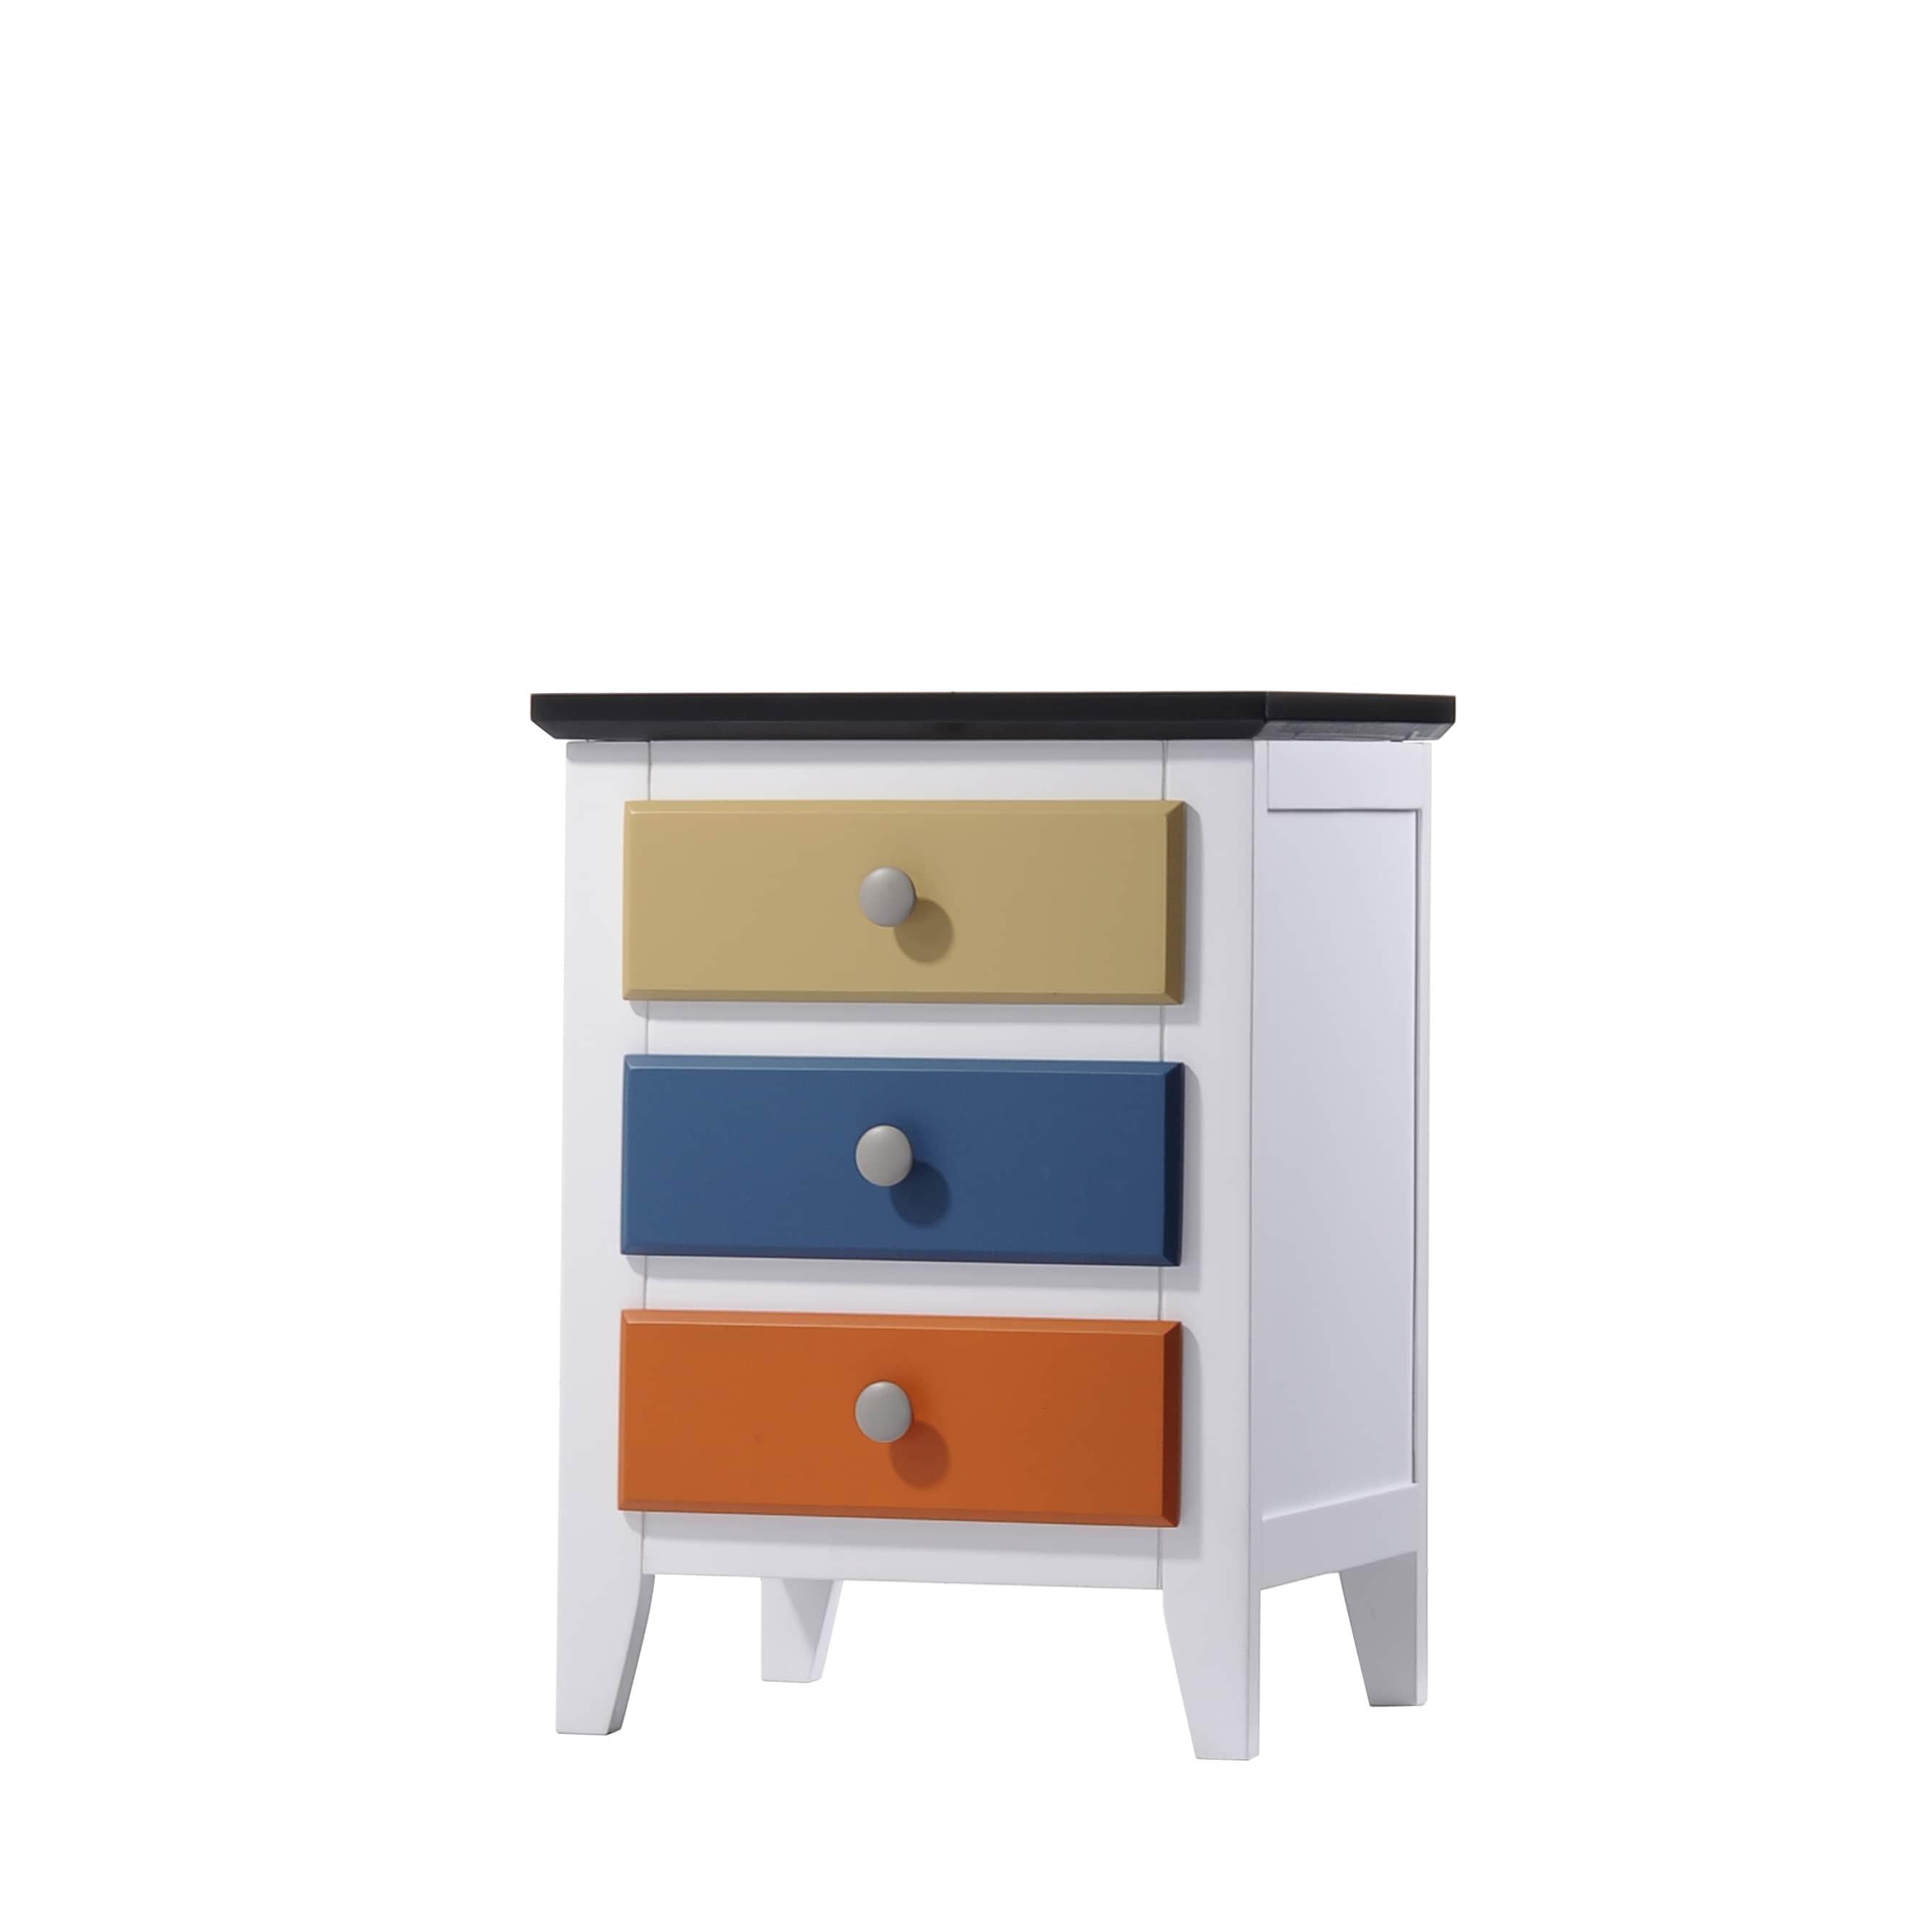 iTALKonline Brooklet White/Multicolor MDF/Wood Nightstand...